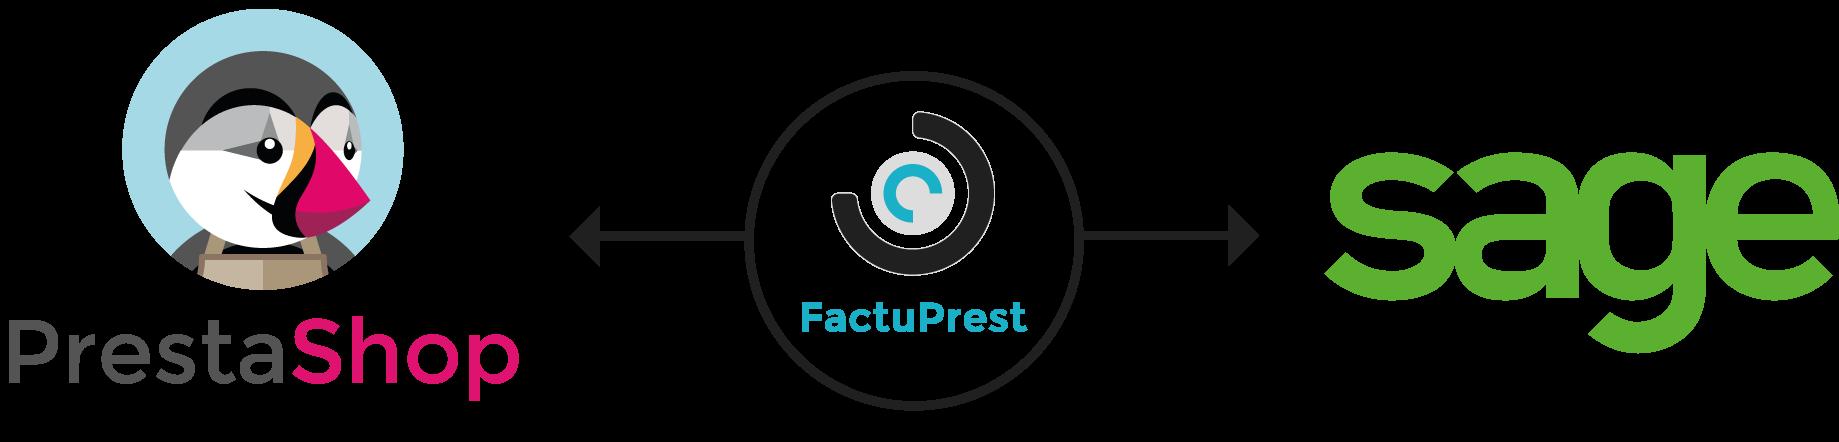 FactuPrest IMG